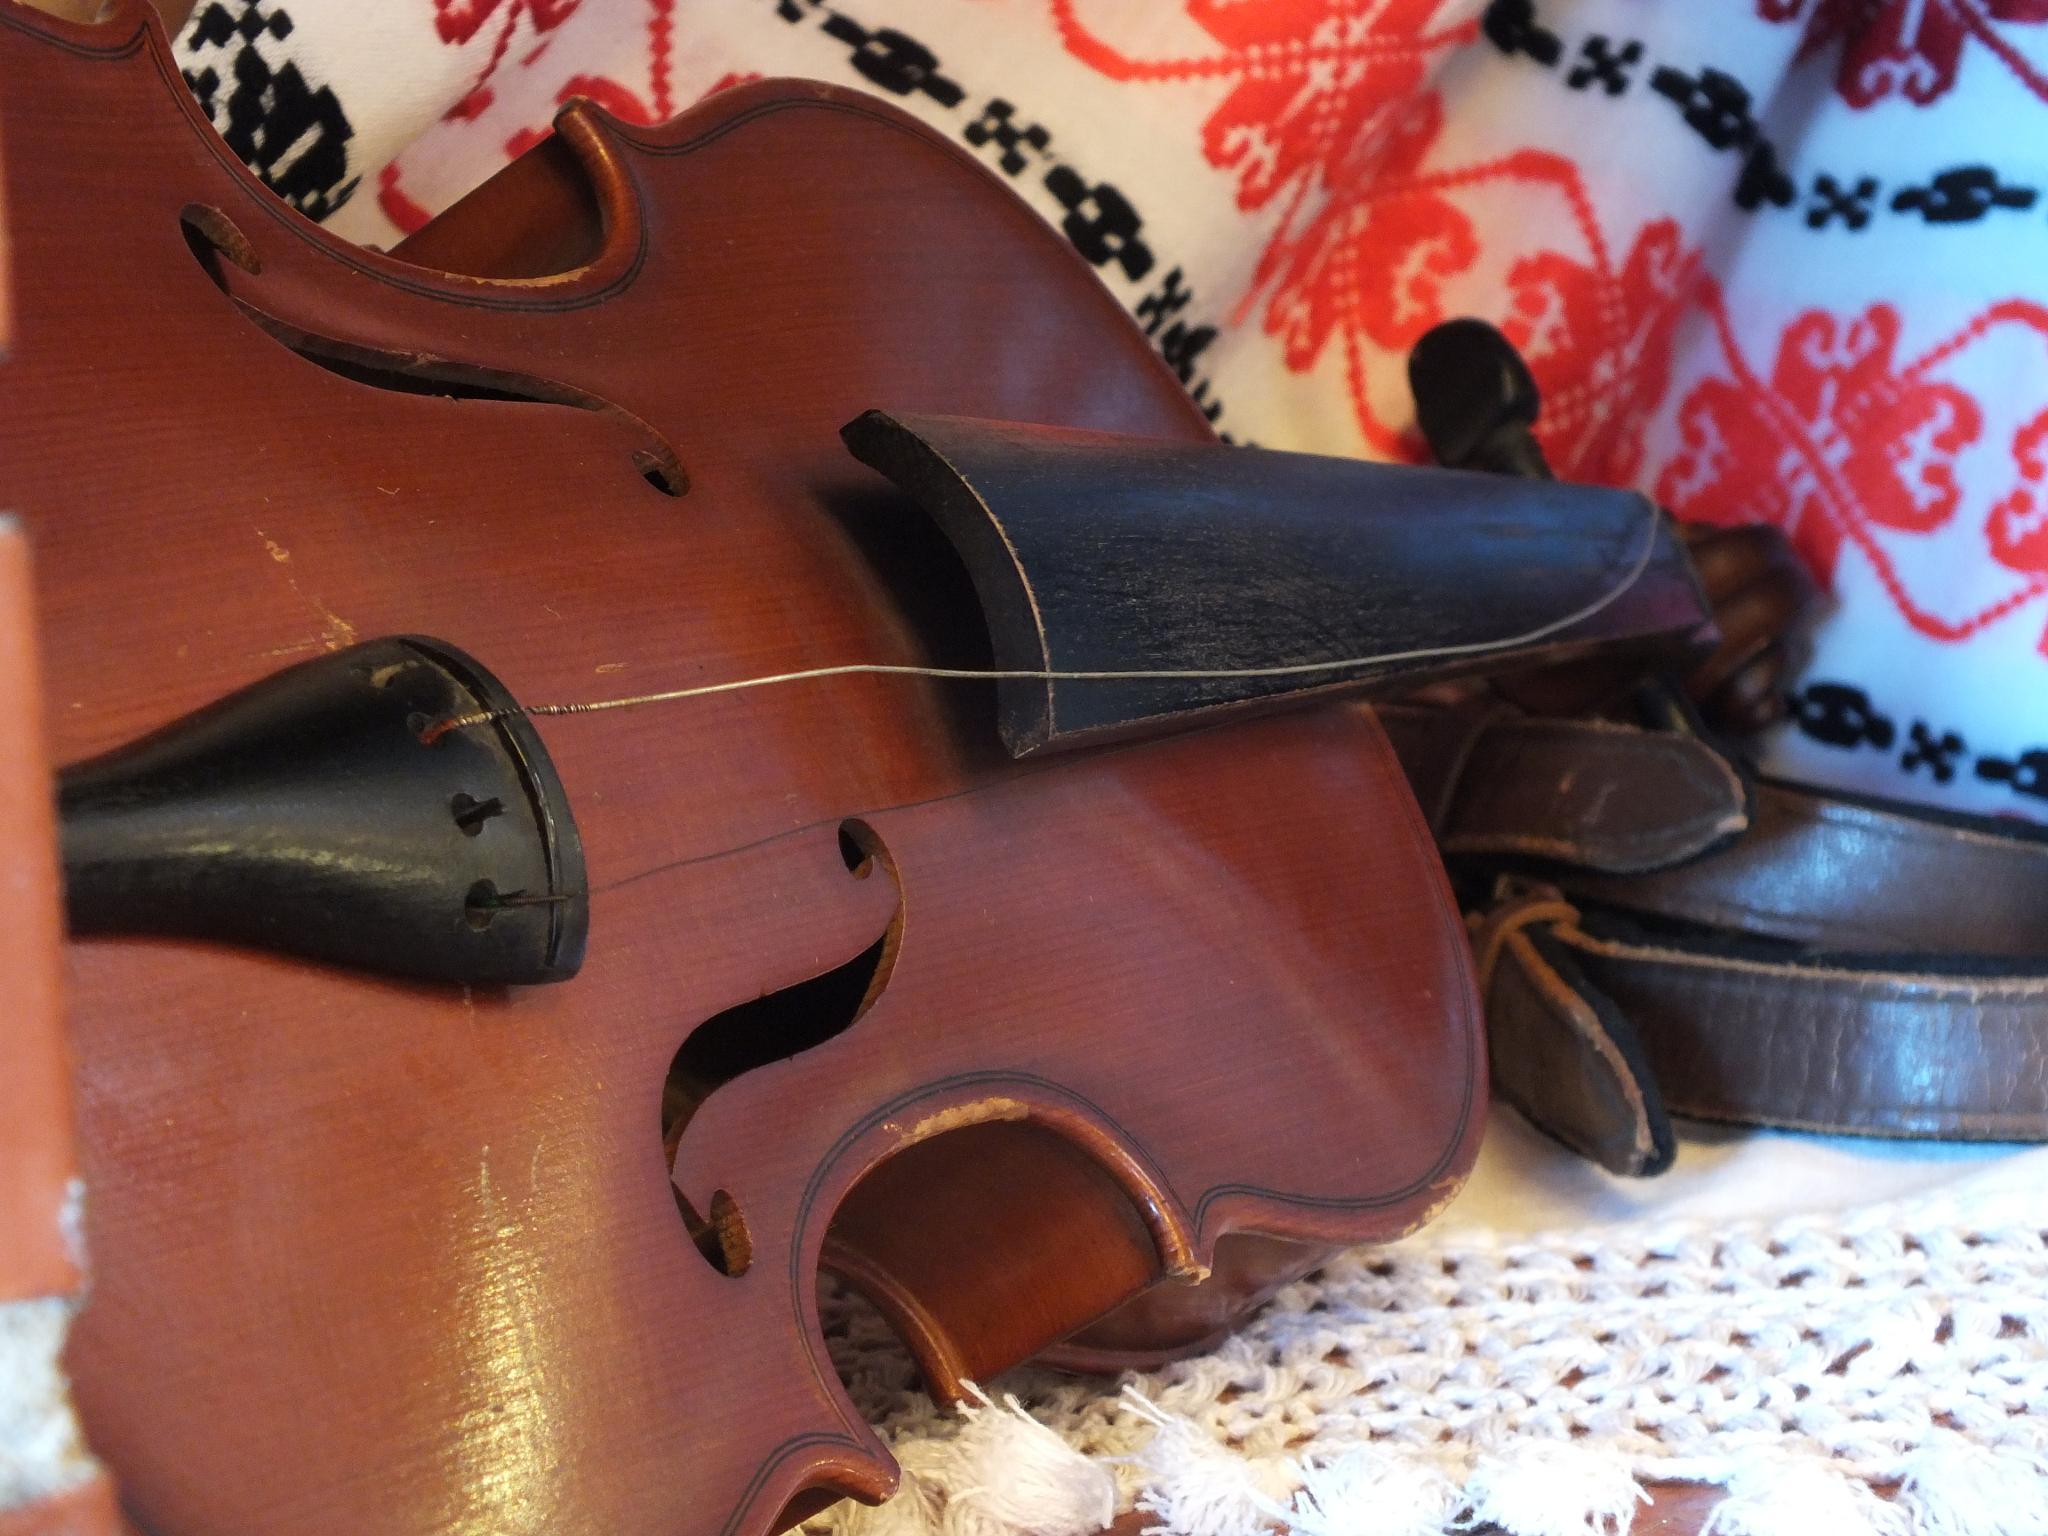 Old violin by Silviu Calistru